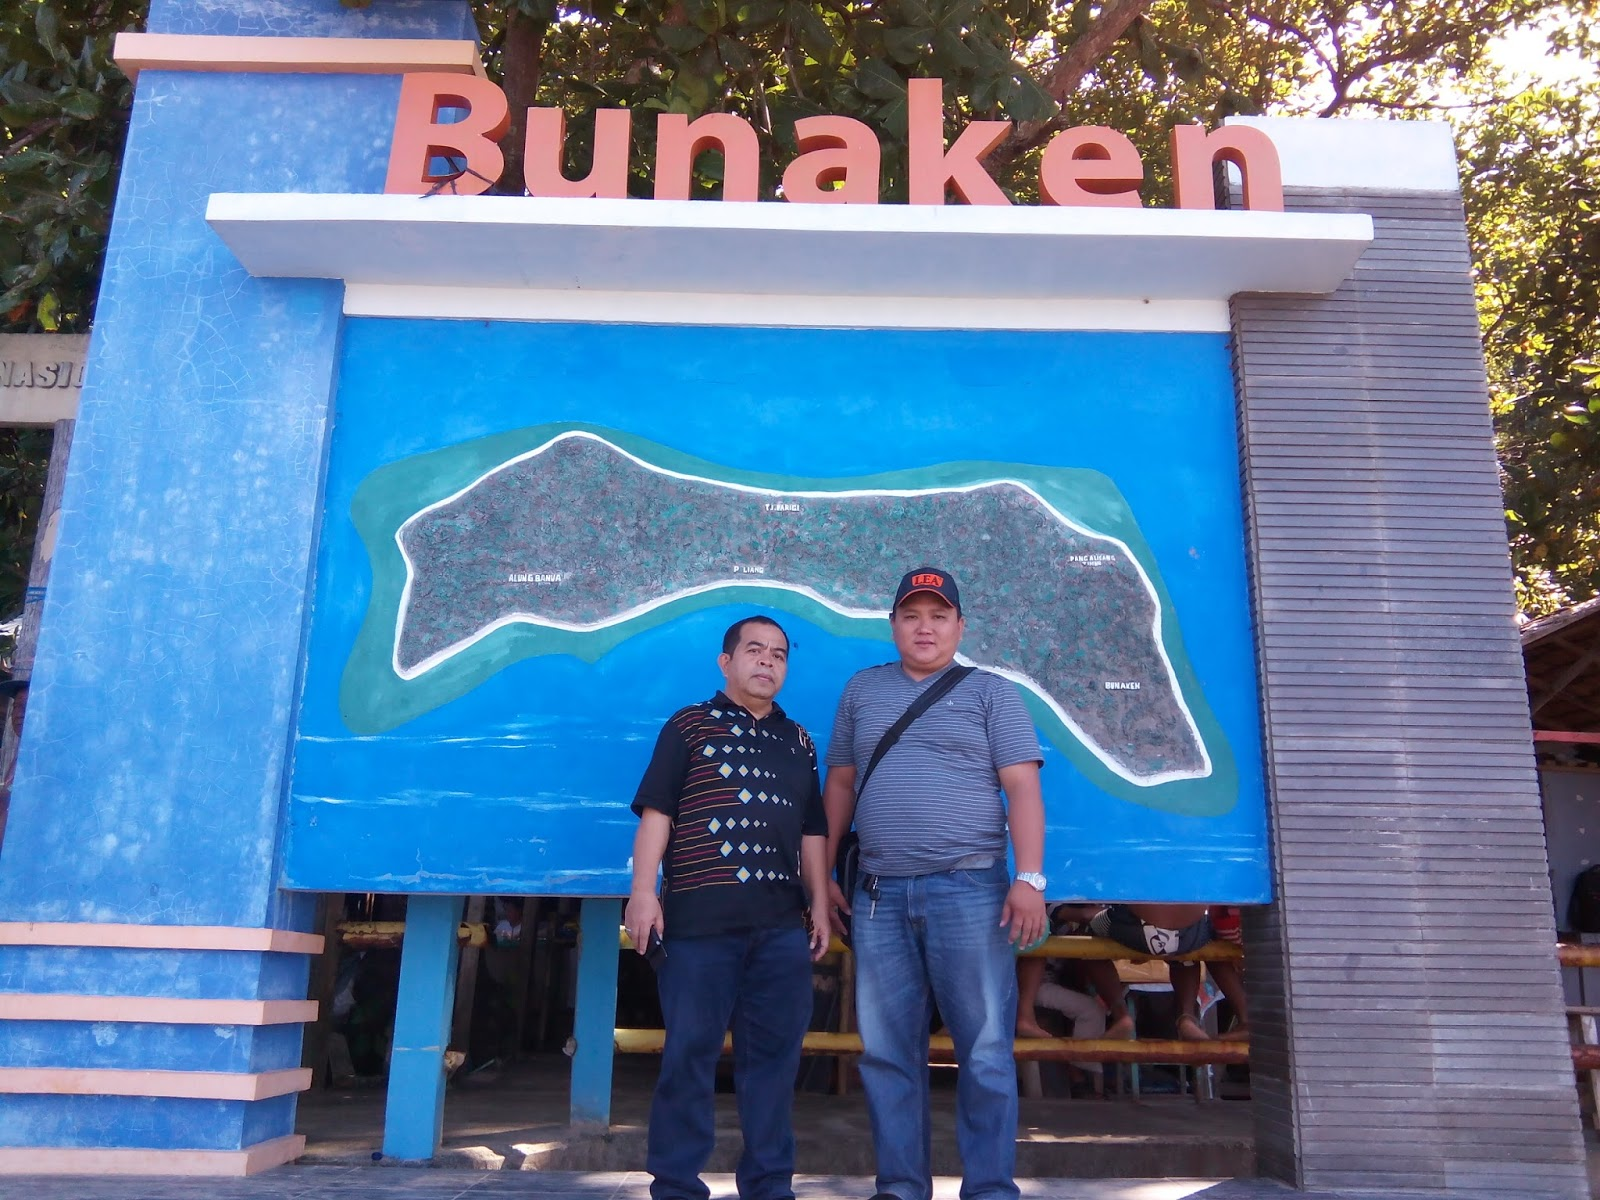 Tikanoorjaya Bunaken Pemandangan Laut Indah Sekitar Pulau Terdapat Taman Bagian